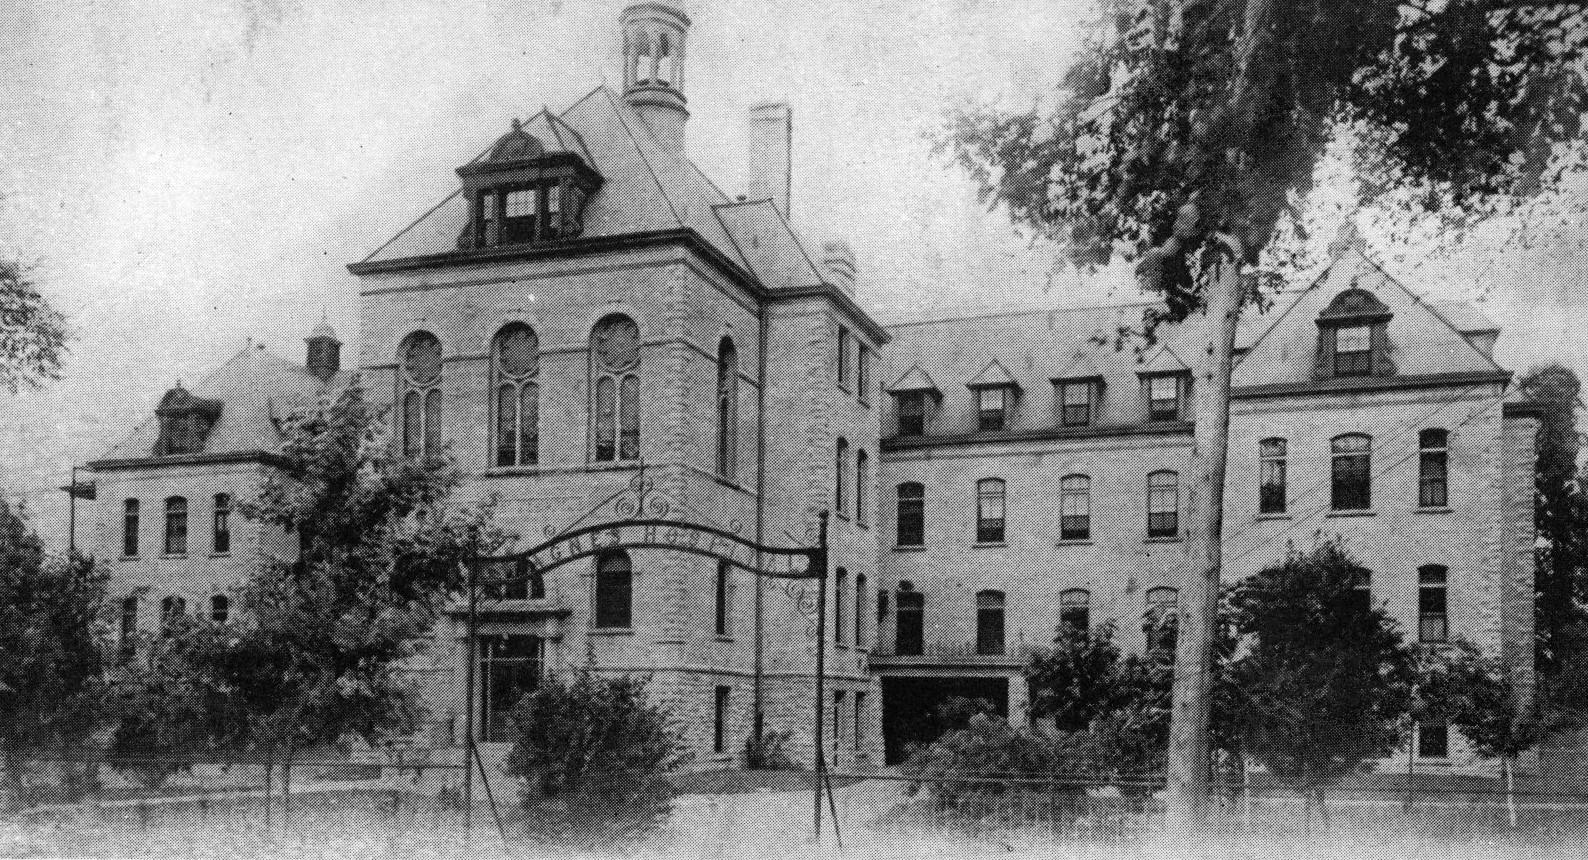 St. Agnes Hospital, c. 1900